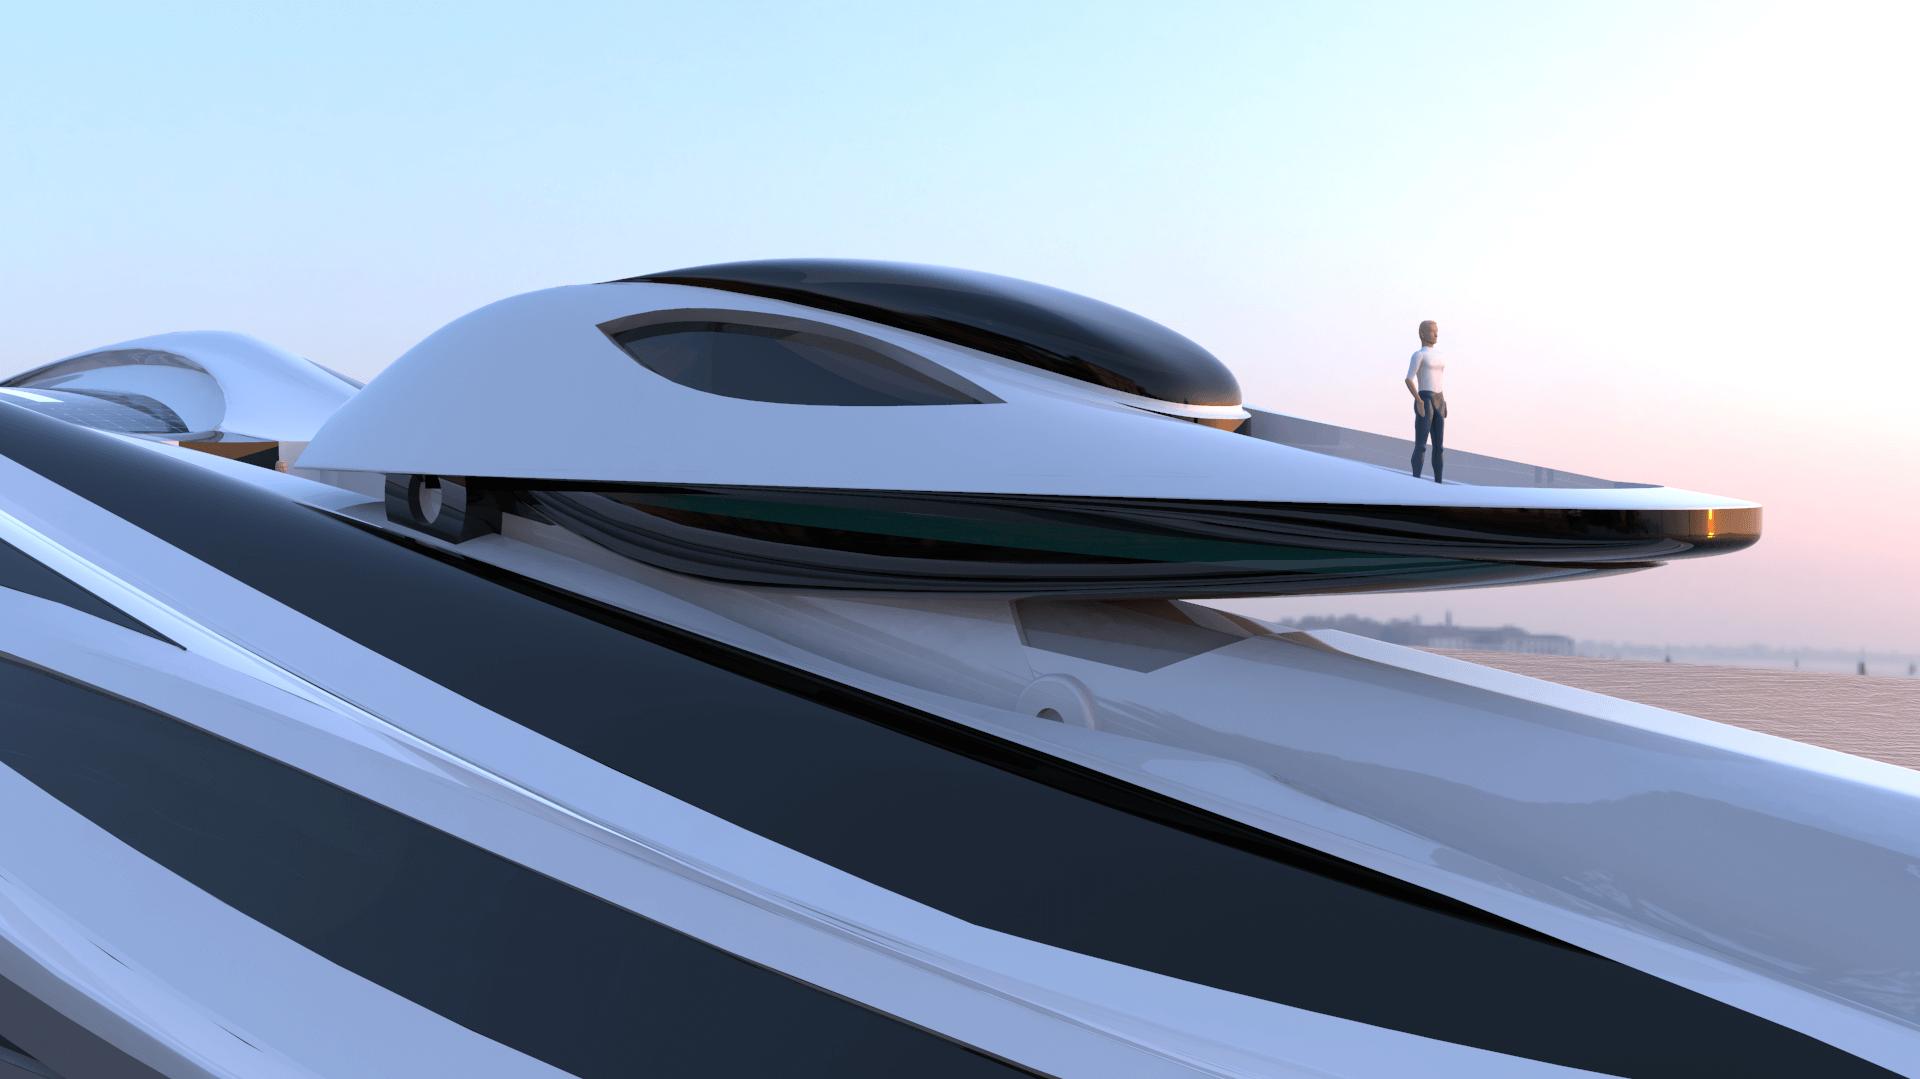 Control platform also doubles as a viewing platform. Credit: Lazzarini Design Studio